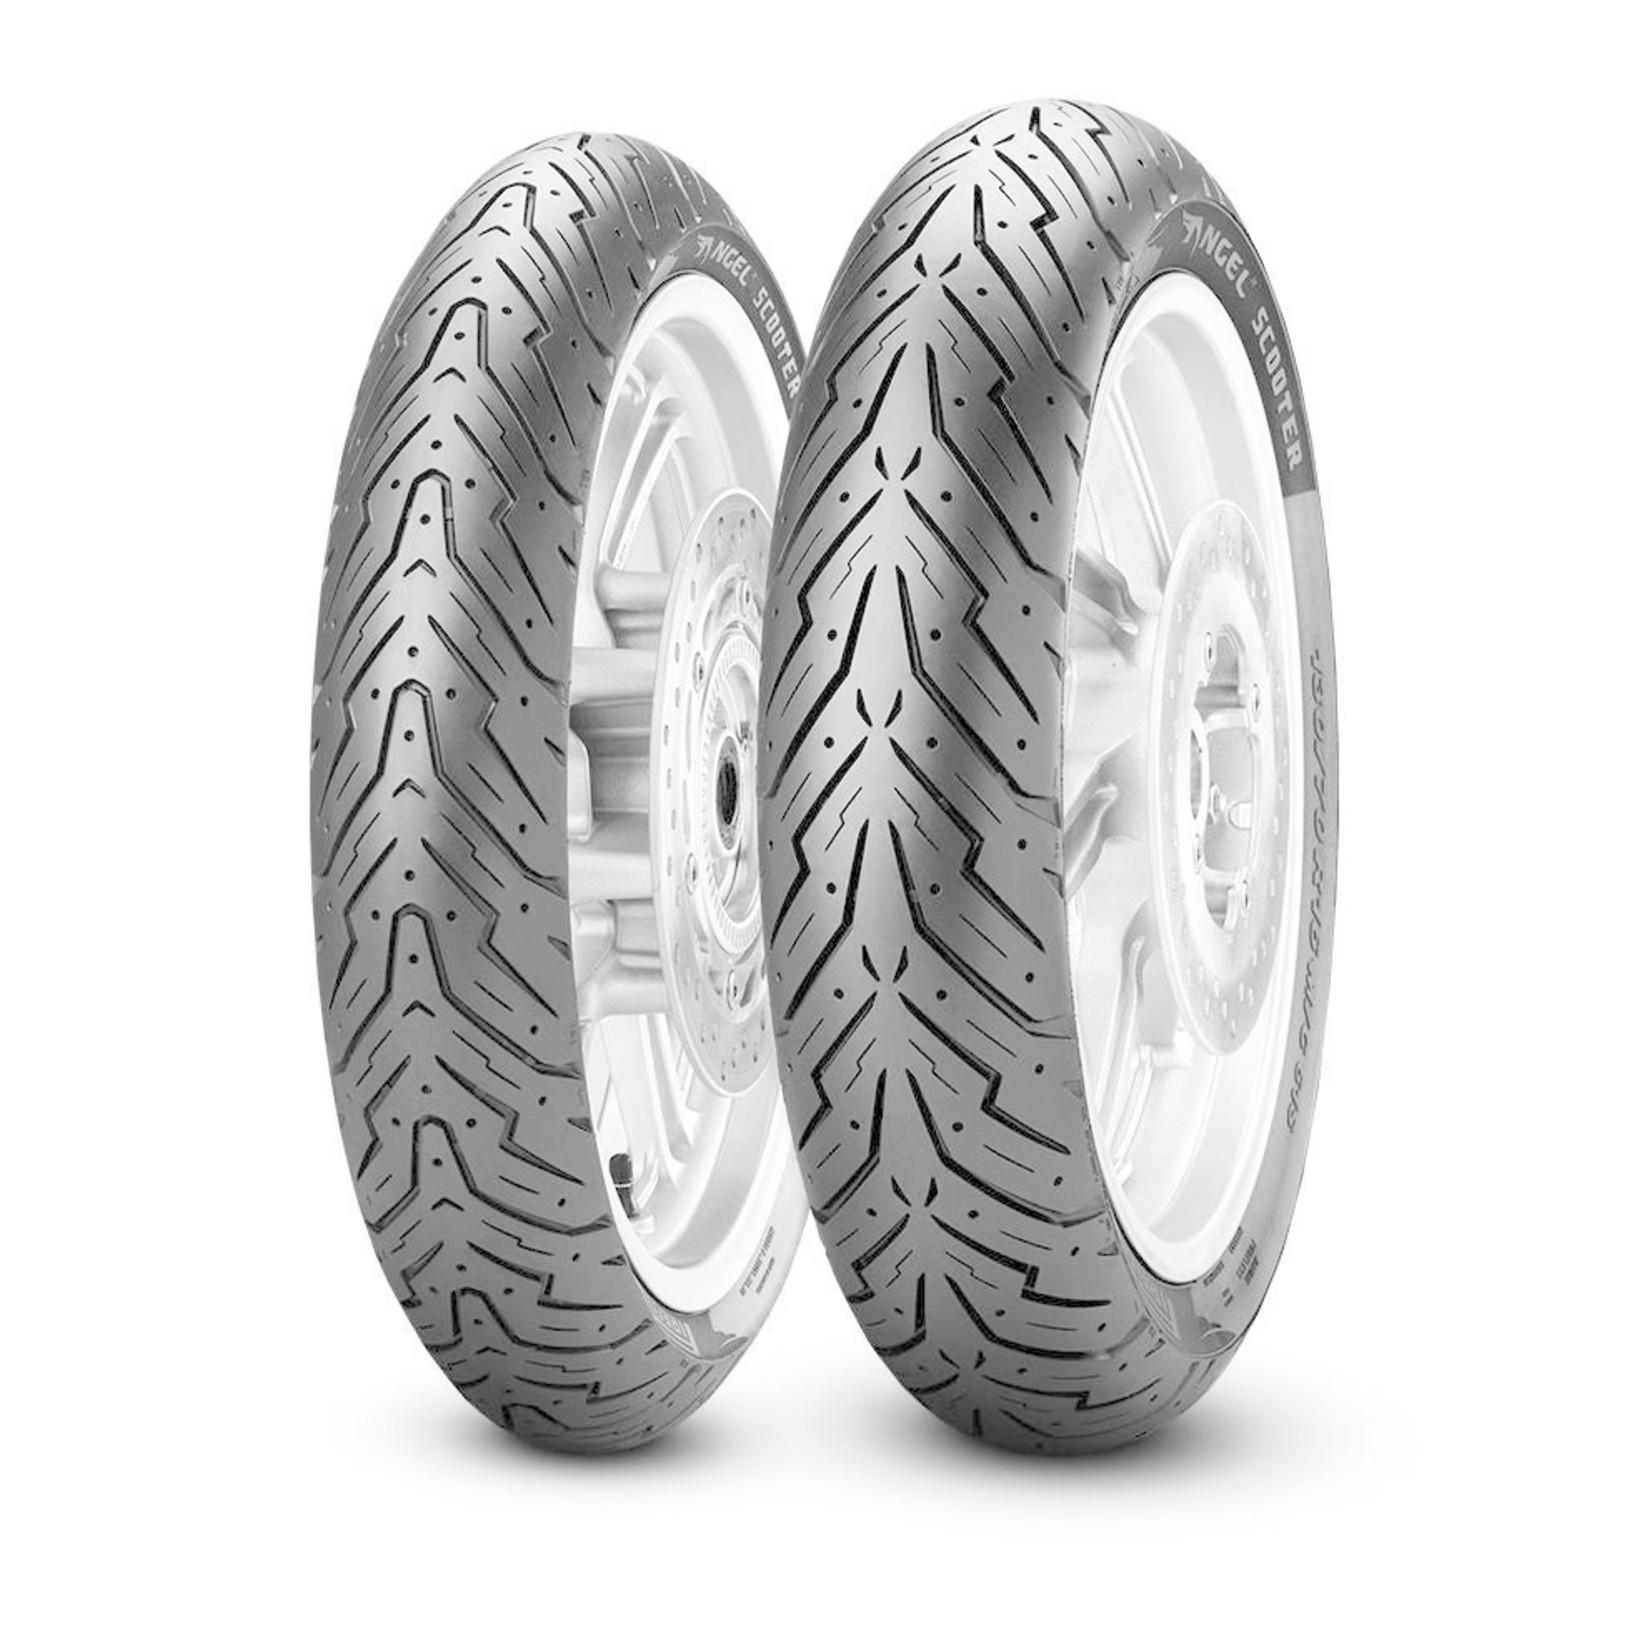 "Parts Tire, Pirelli Angel 120/70-11"" (56L) Front/Rear"